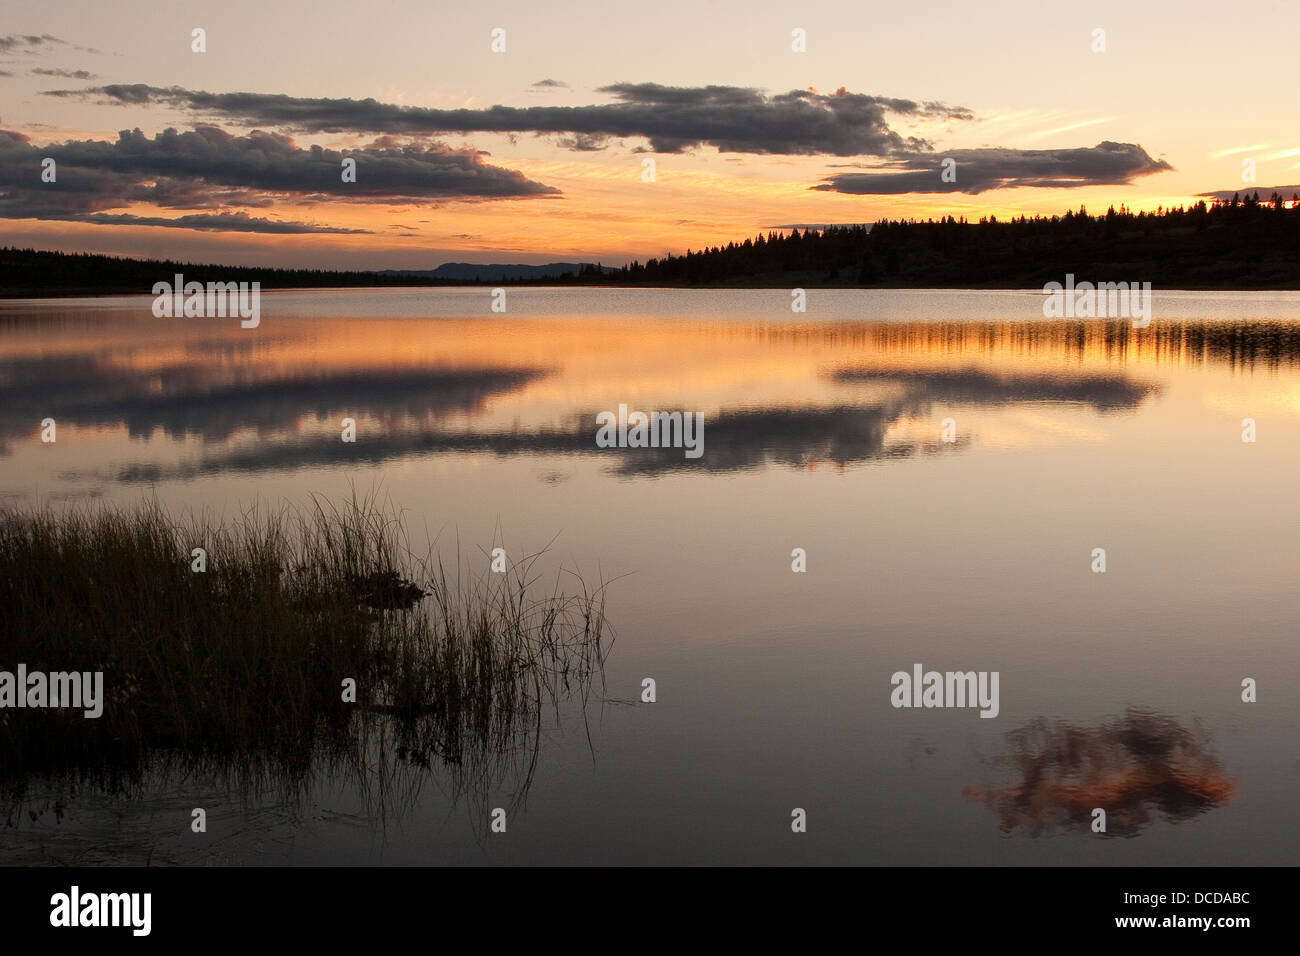 Abendstimmung an einem See in Skandinavien, Norwegen, Sonnenuntergang, Evening mood in a lake in Scandinavia, Norway, sundown Stock Photo